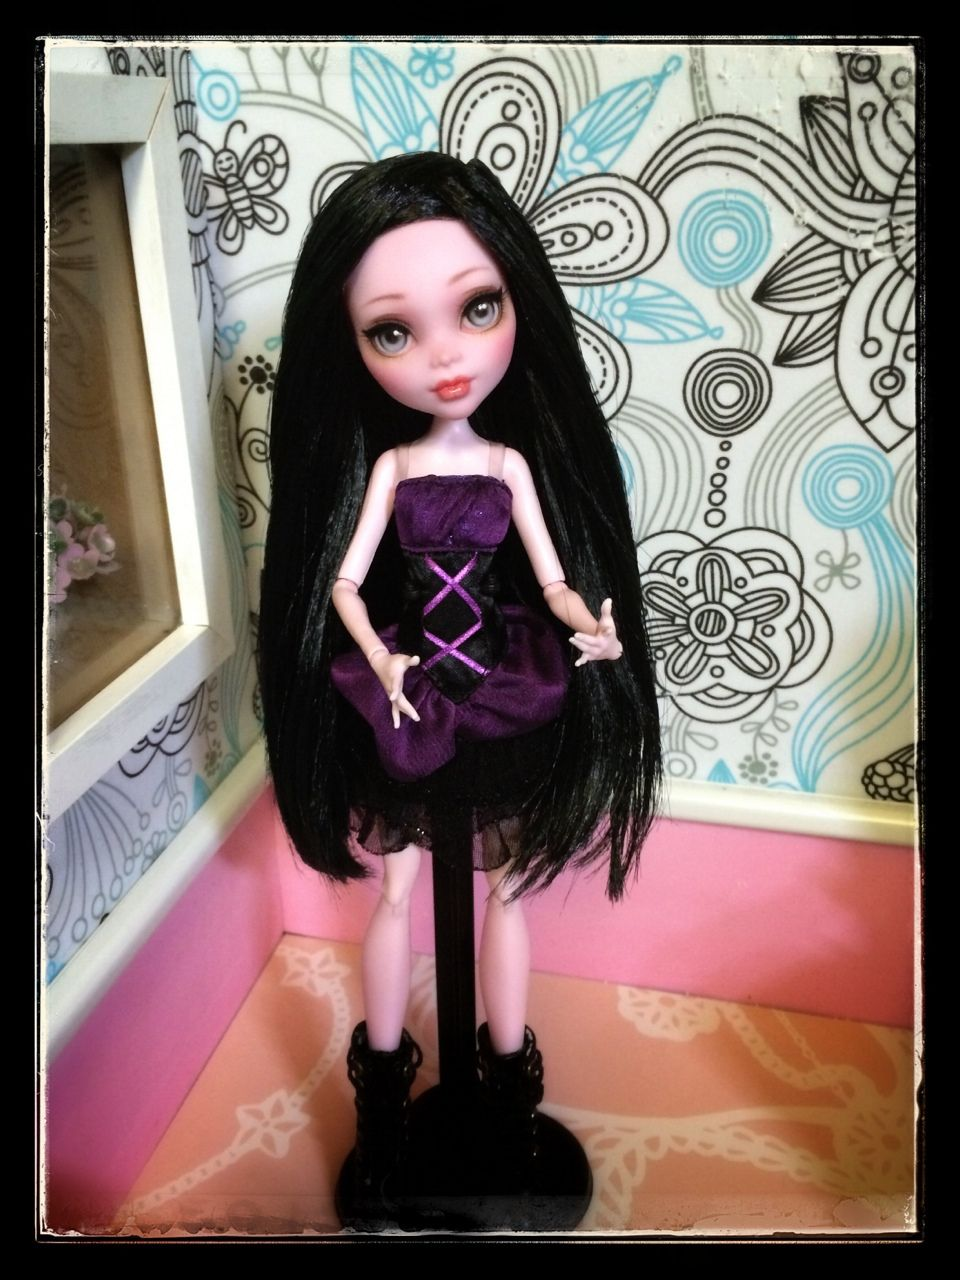 Elissabat, her change :)